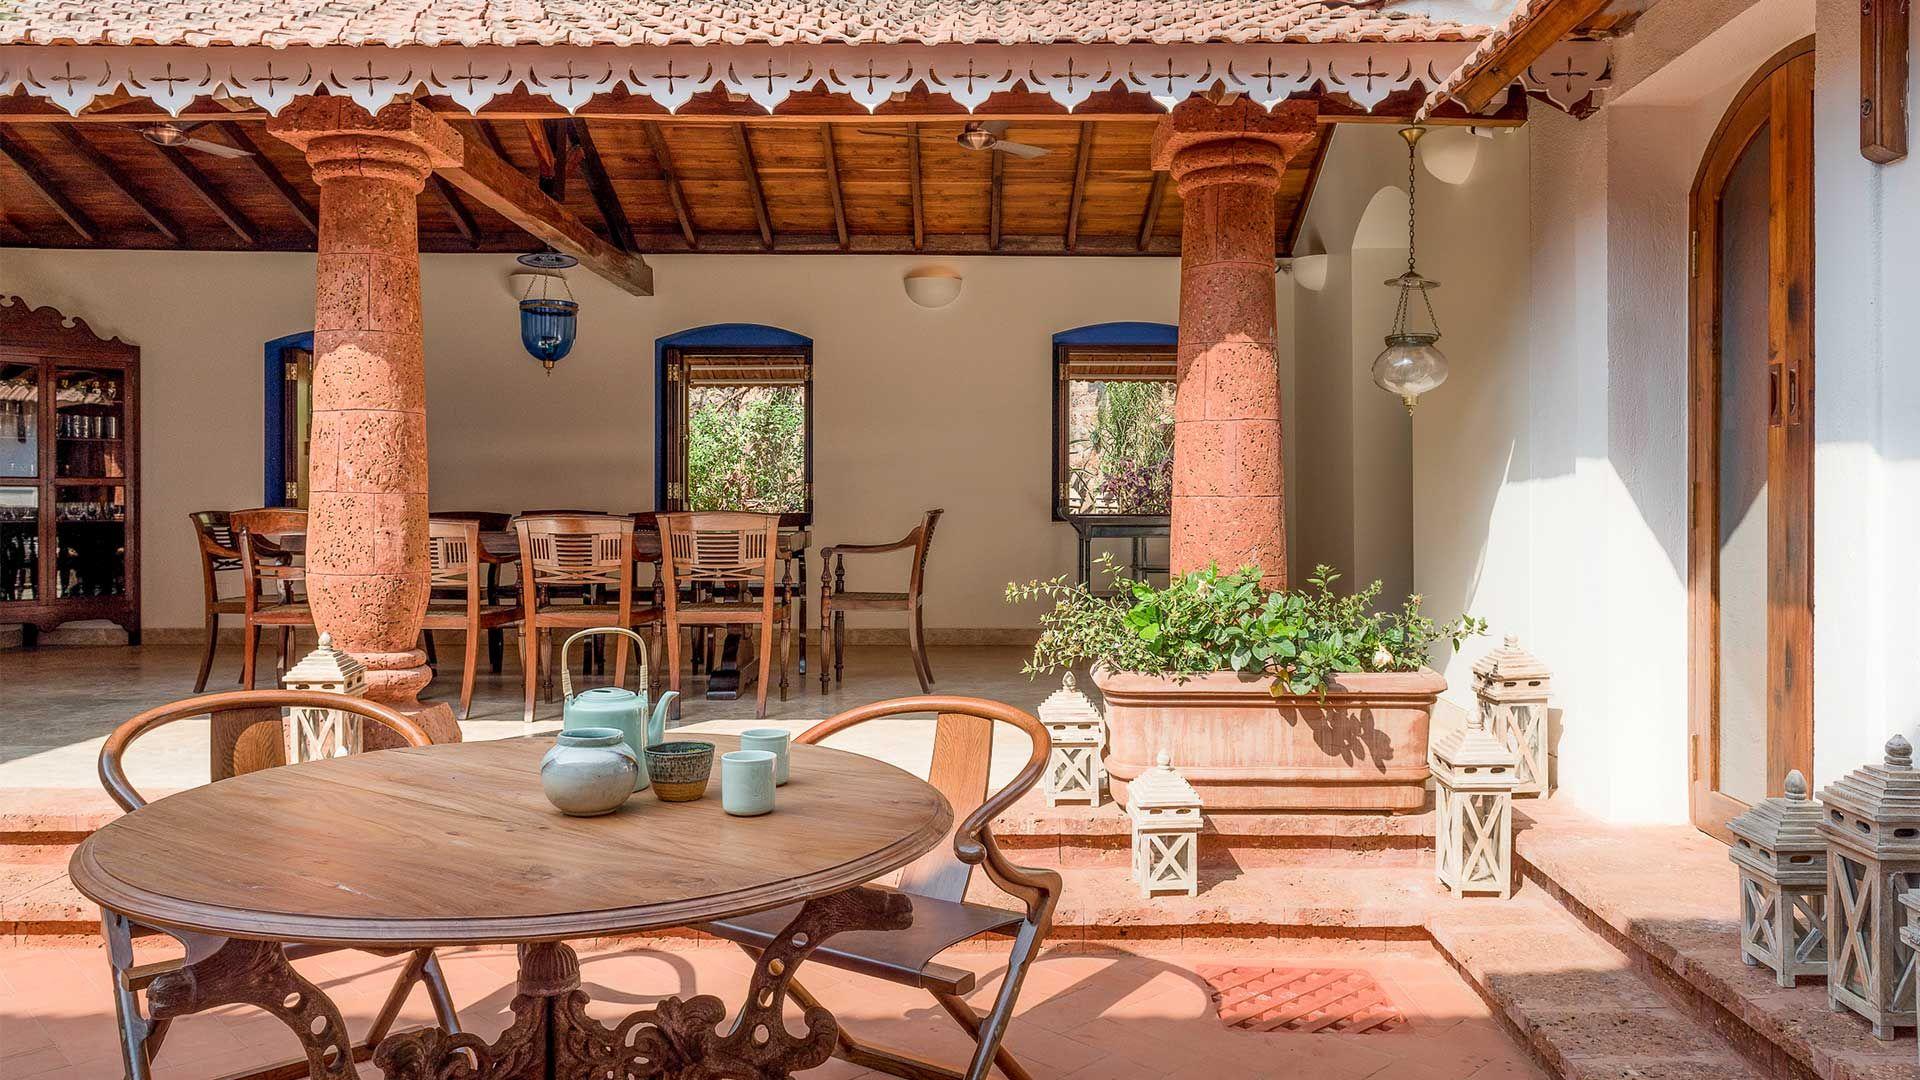 Desktop Home Interior Design Goa Of Ideas Mobile Phones Hd Pics Momodesigngoa Country Courtyard House